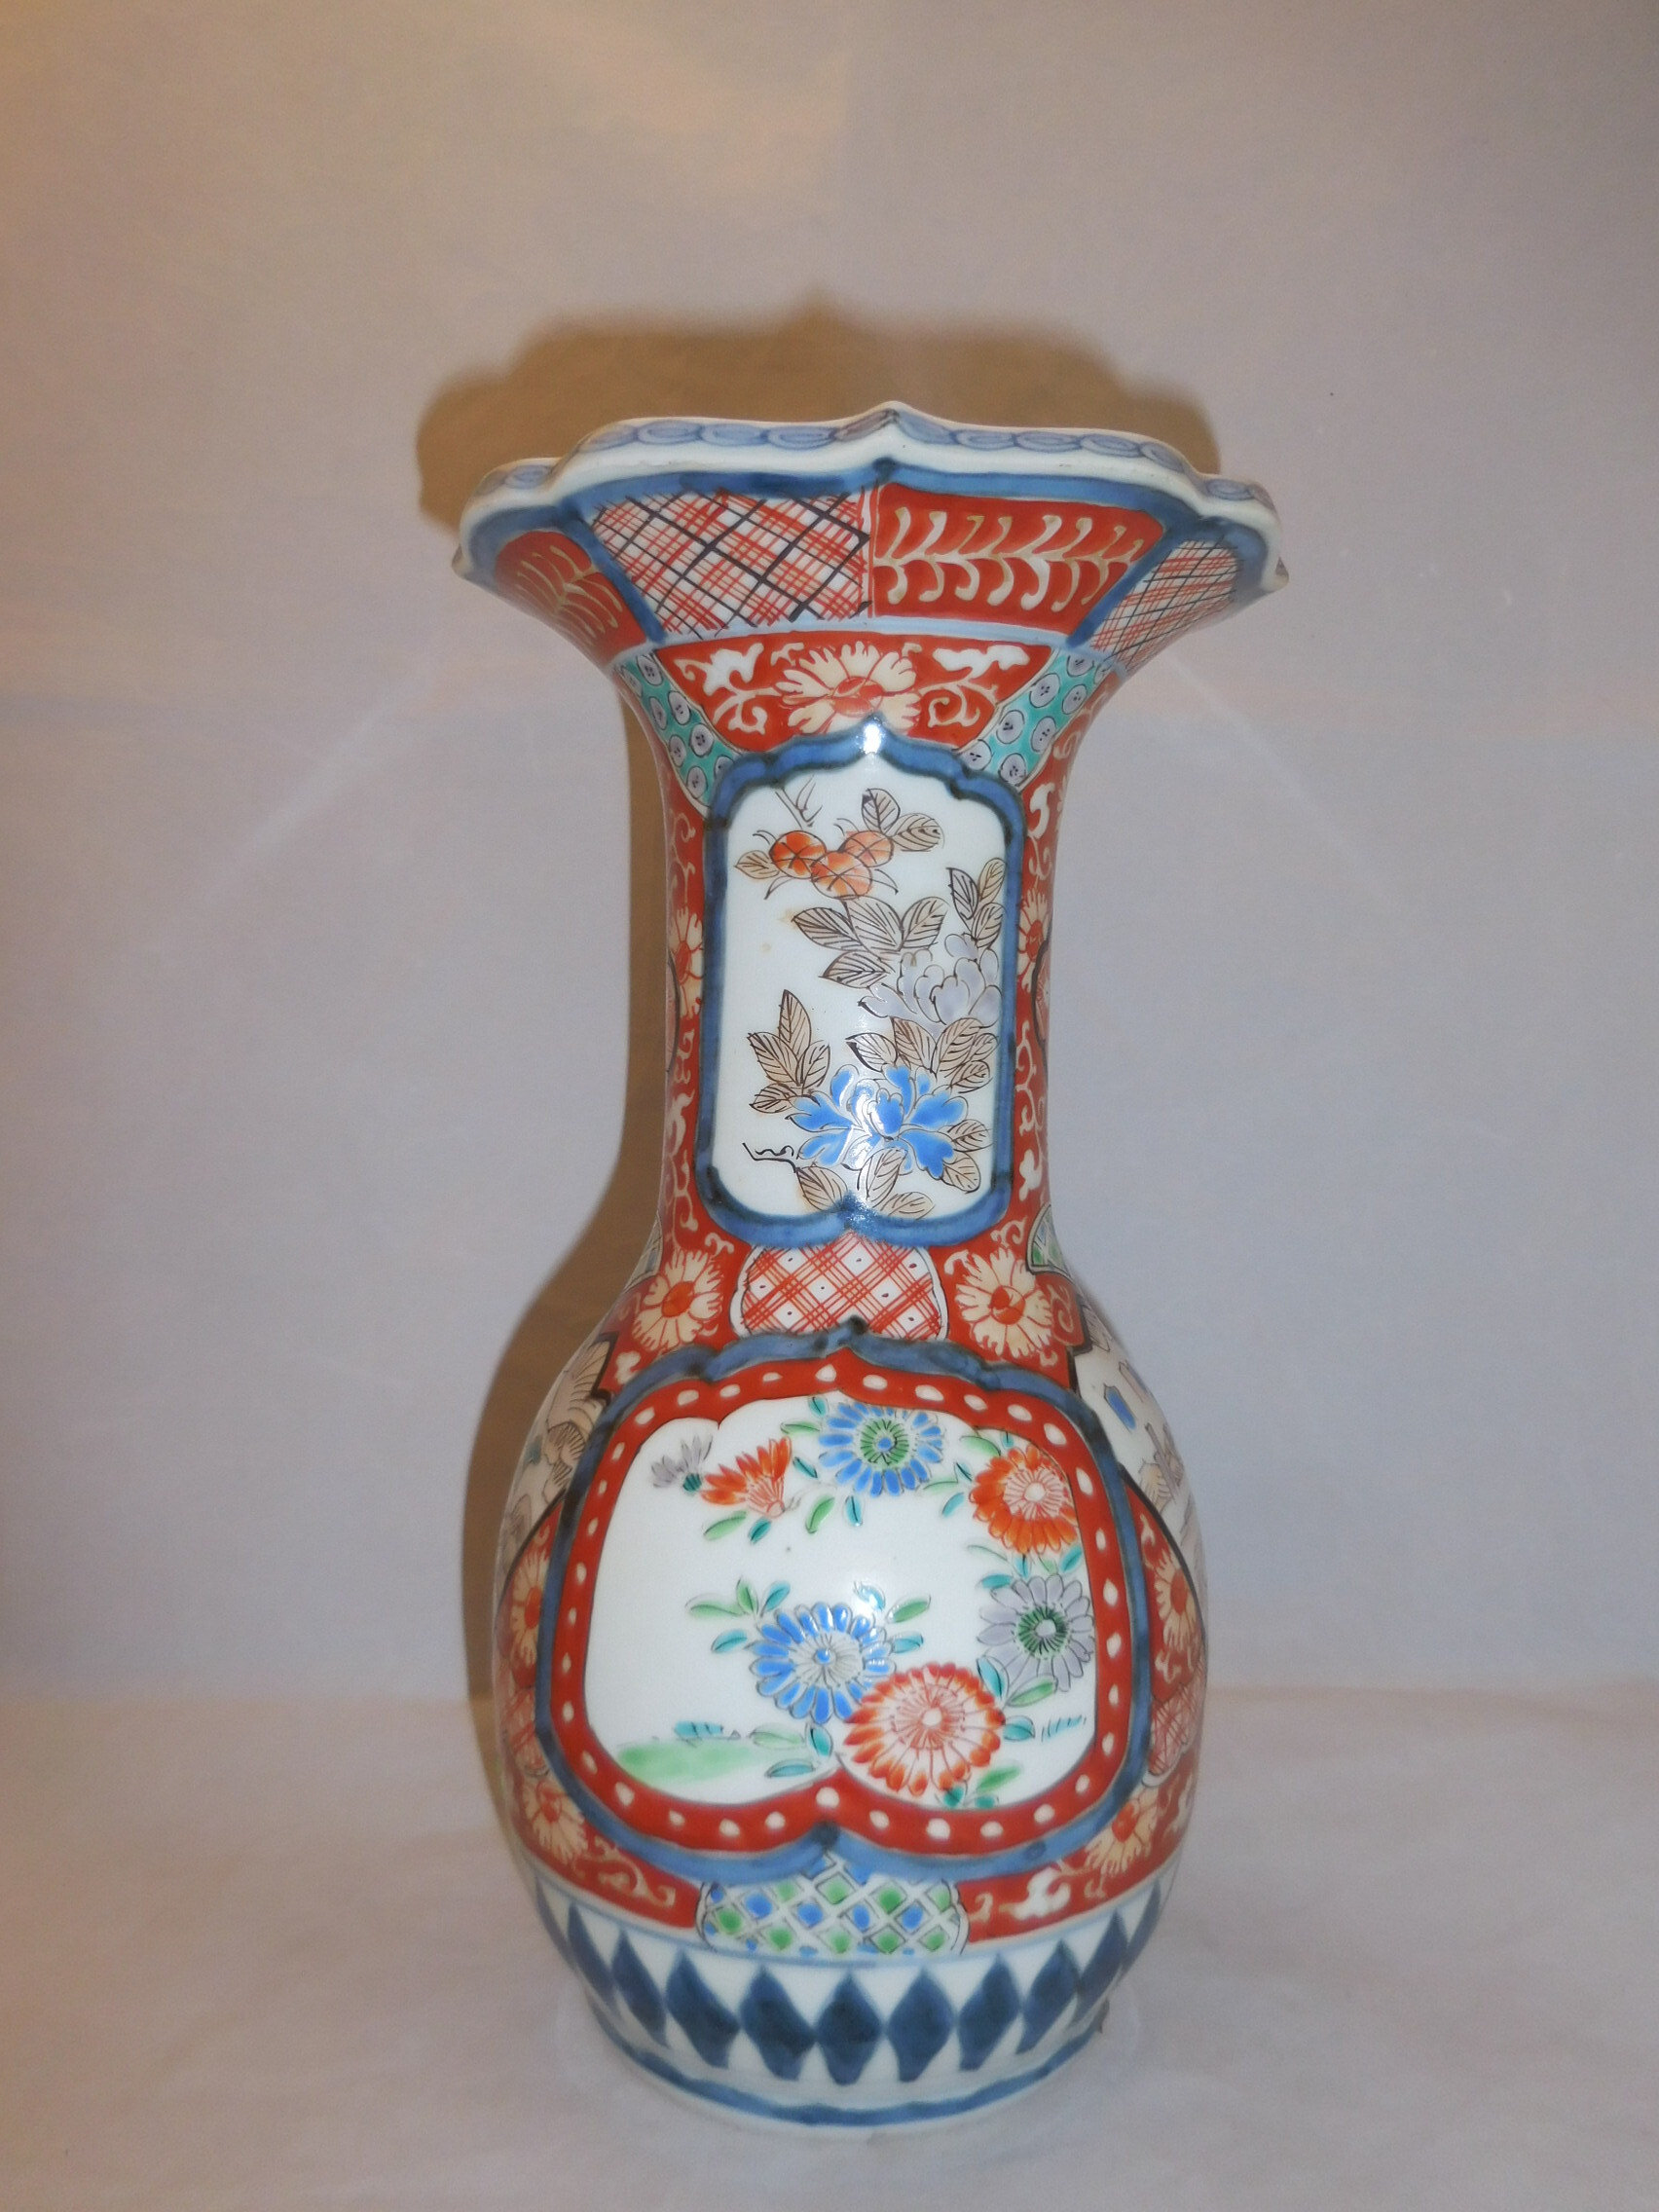 伊万里色絵広口花器 Imari porcelain vase(flowers)